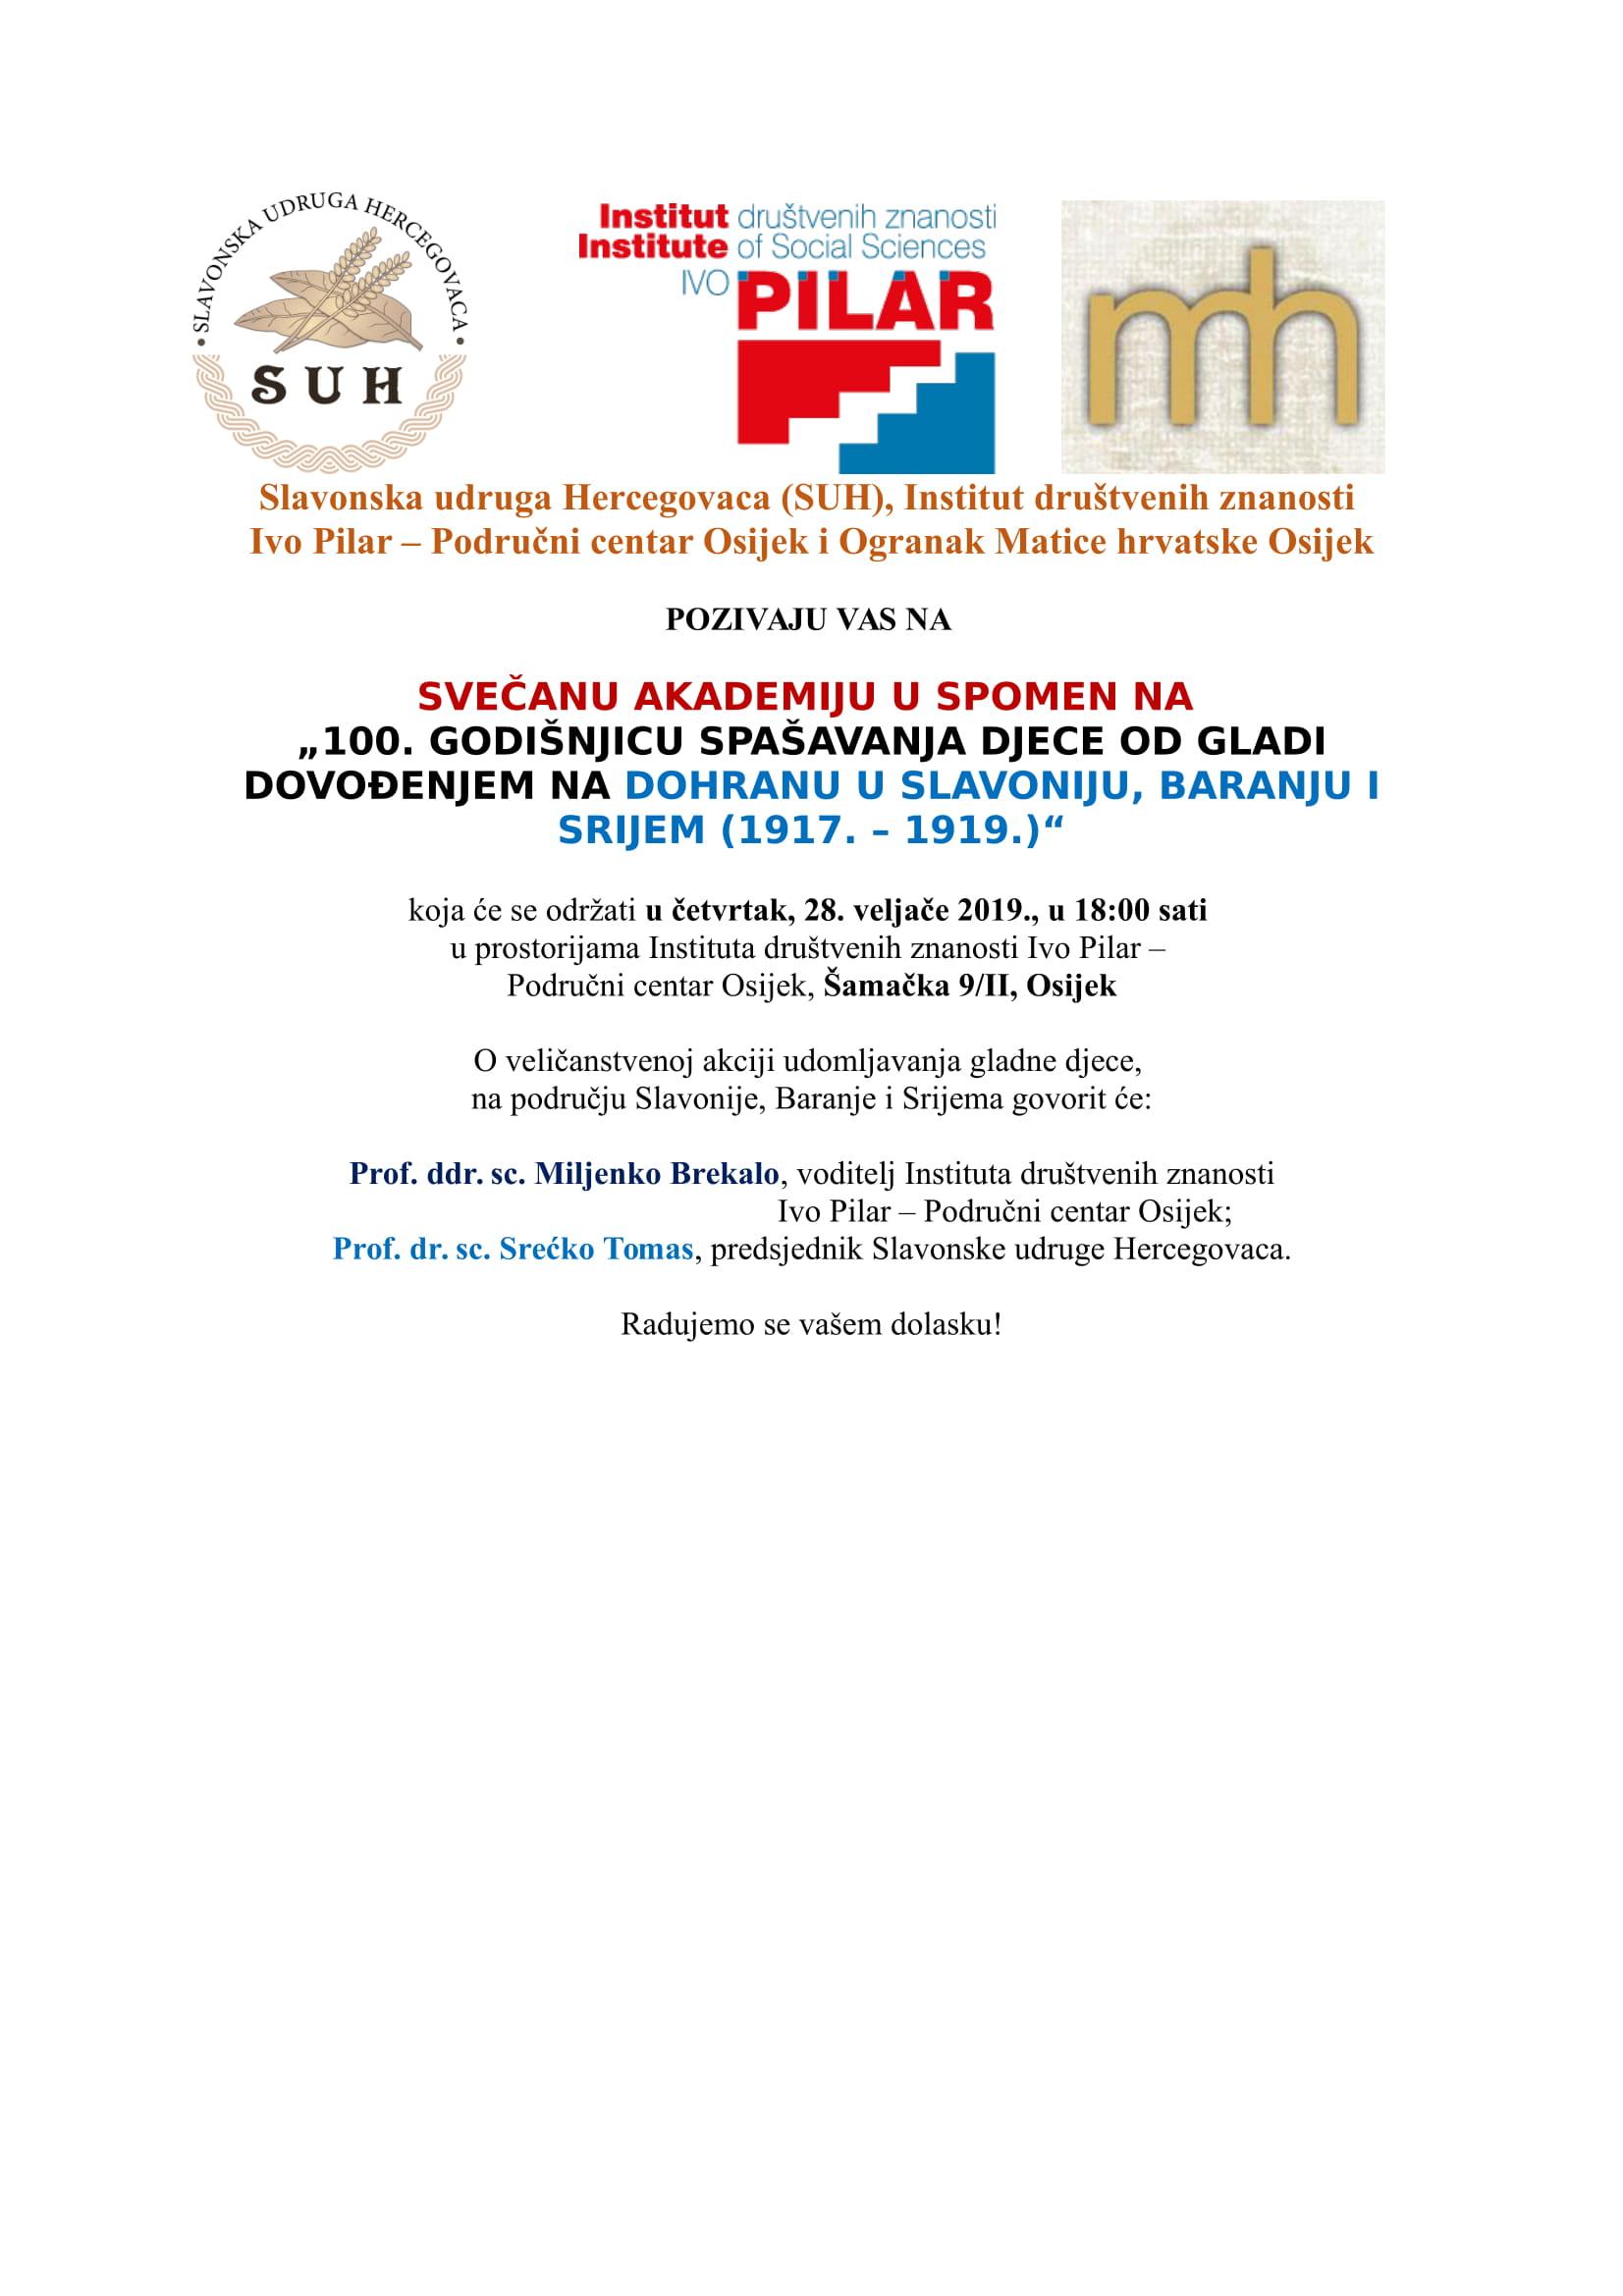 Poziv za Akademiju za 28-II-2019-1